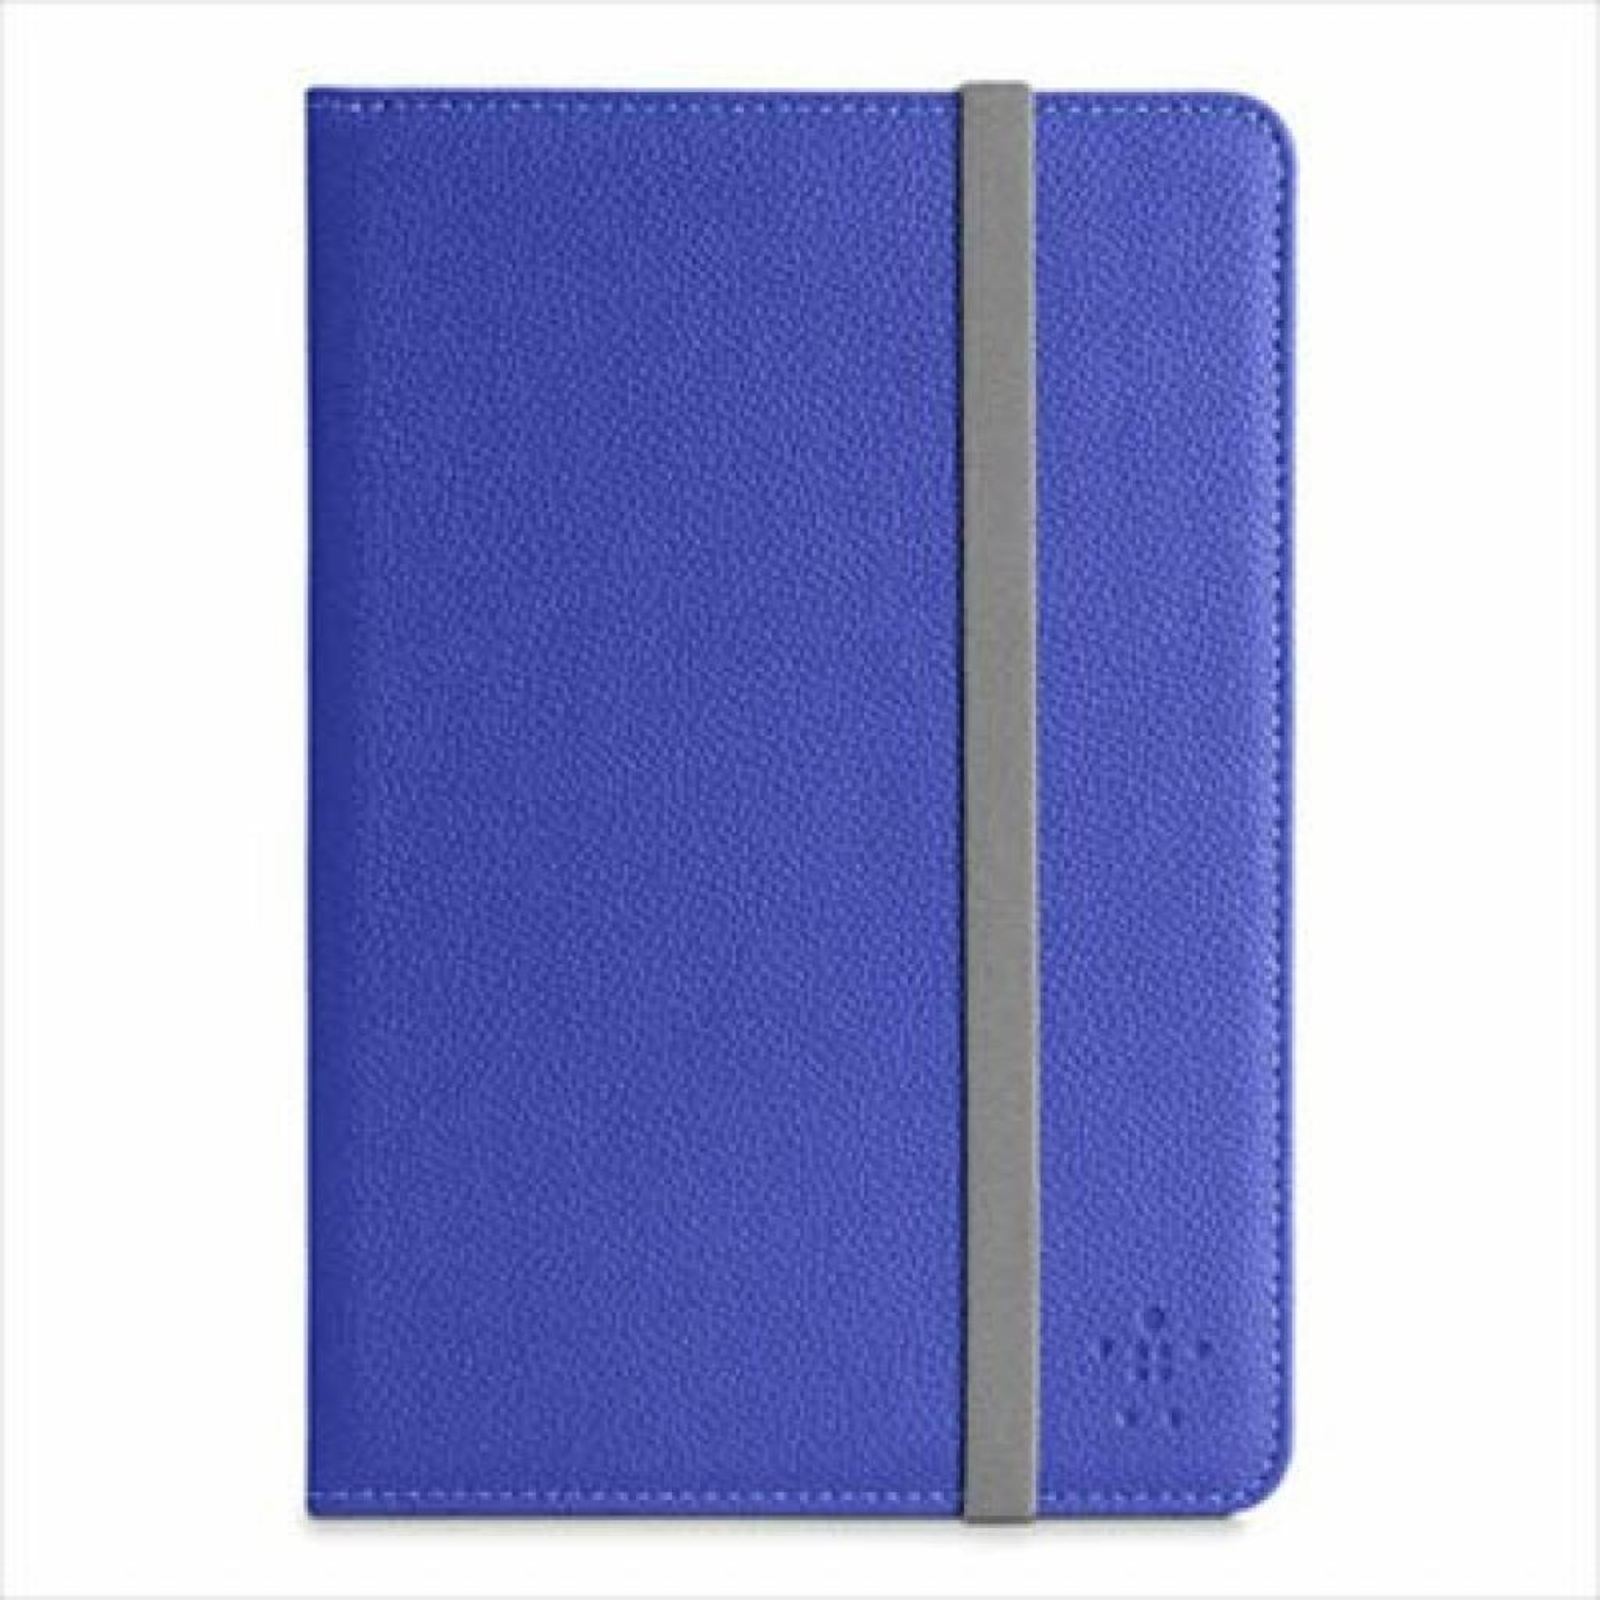 Чехол для планшета Belkin Classic Strap Cover (F7N032vfC01)